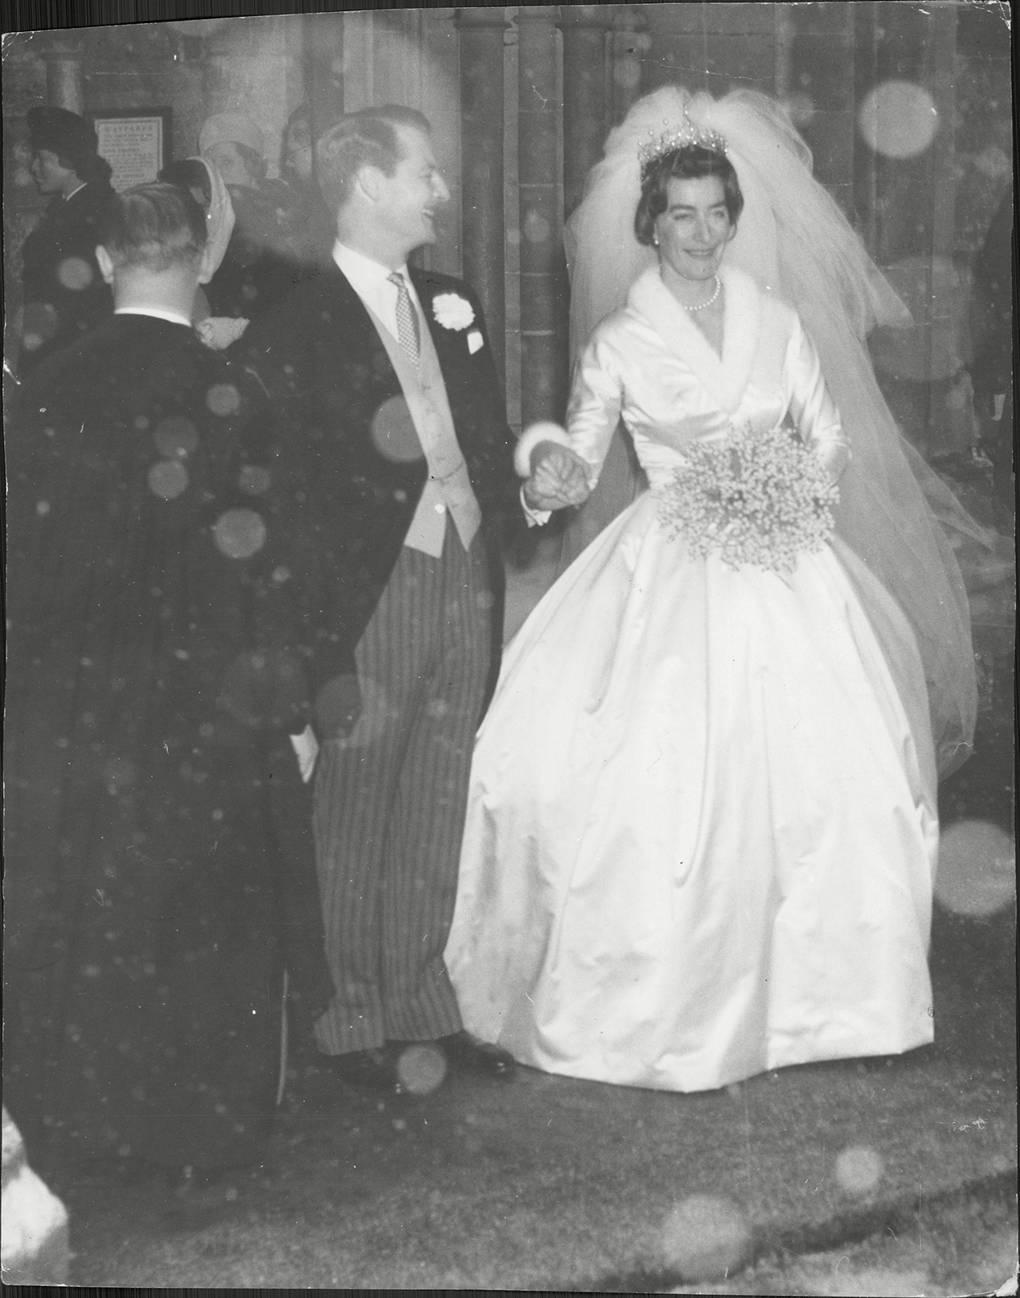 on-wedding-day-jan-1960-shutterstock_editorial_1933005a_huge